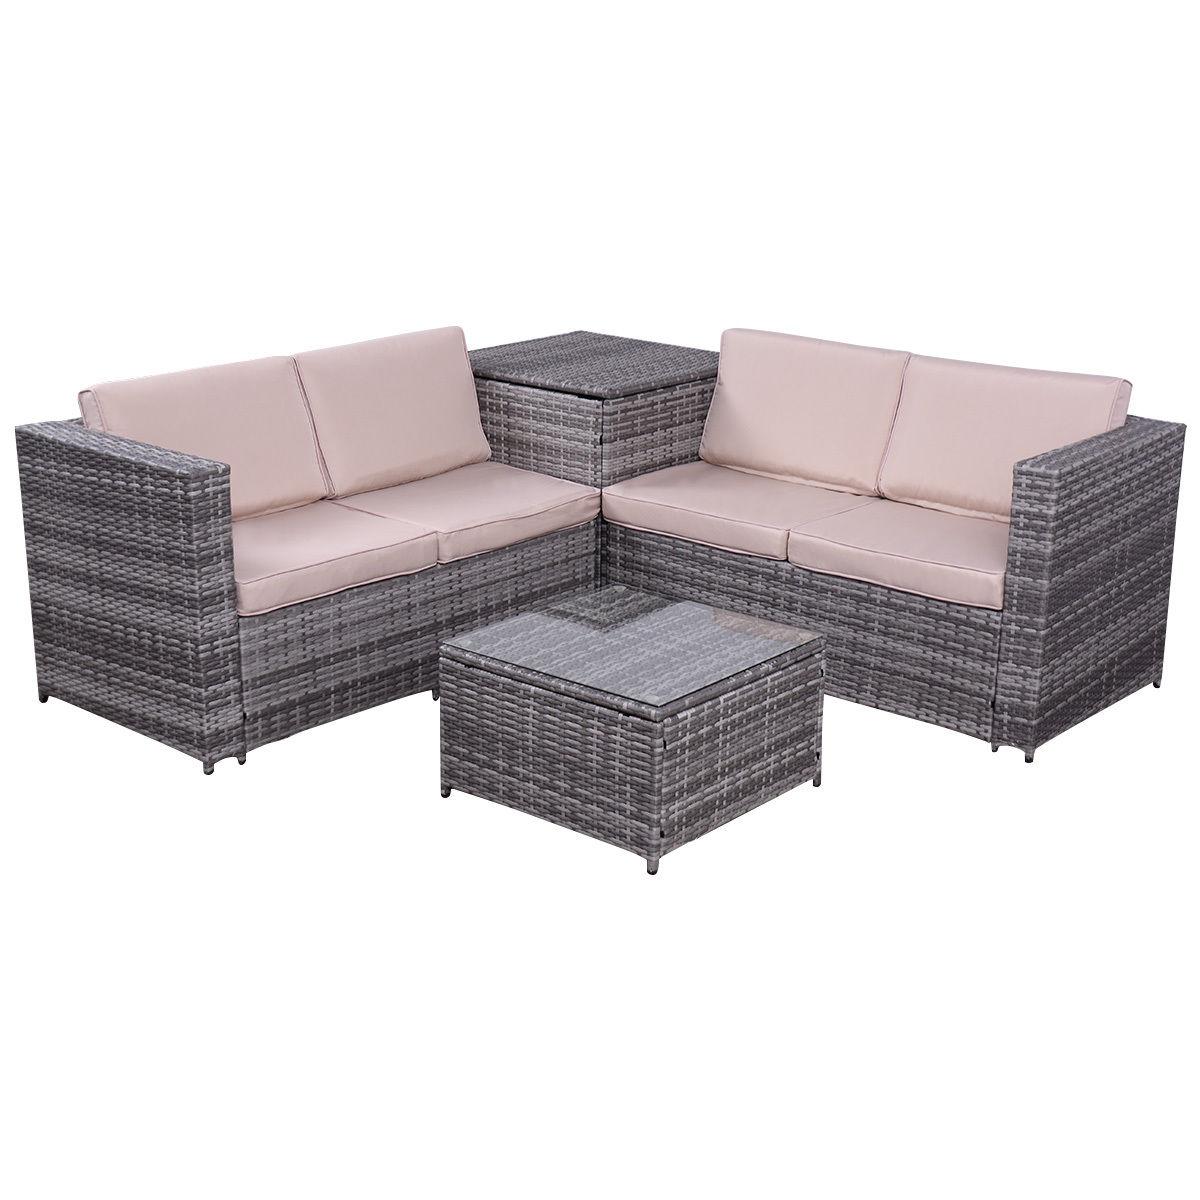 Costway 4PCS Patio Rattan Wicker Furniture Set Sofa Loveseat Cushioned W Storage Box by Costway